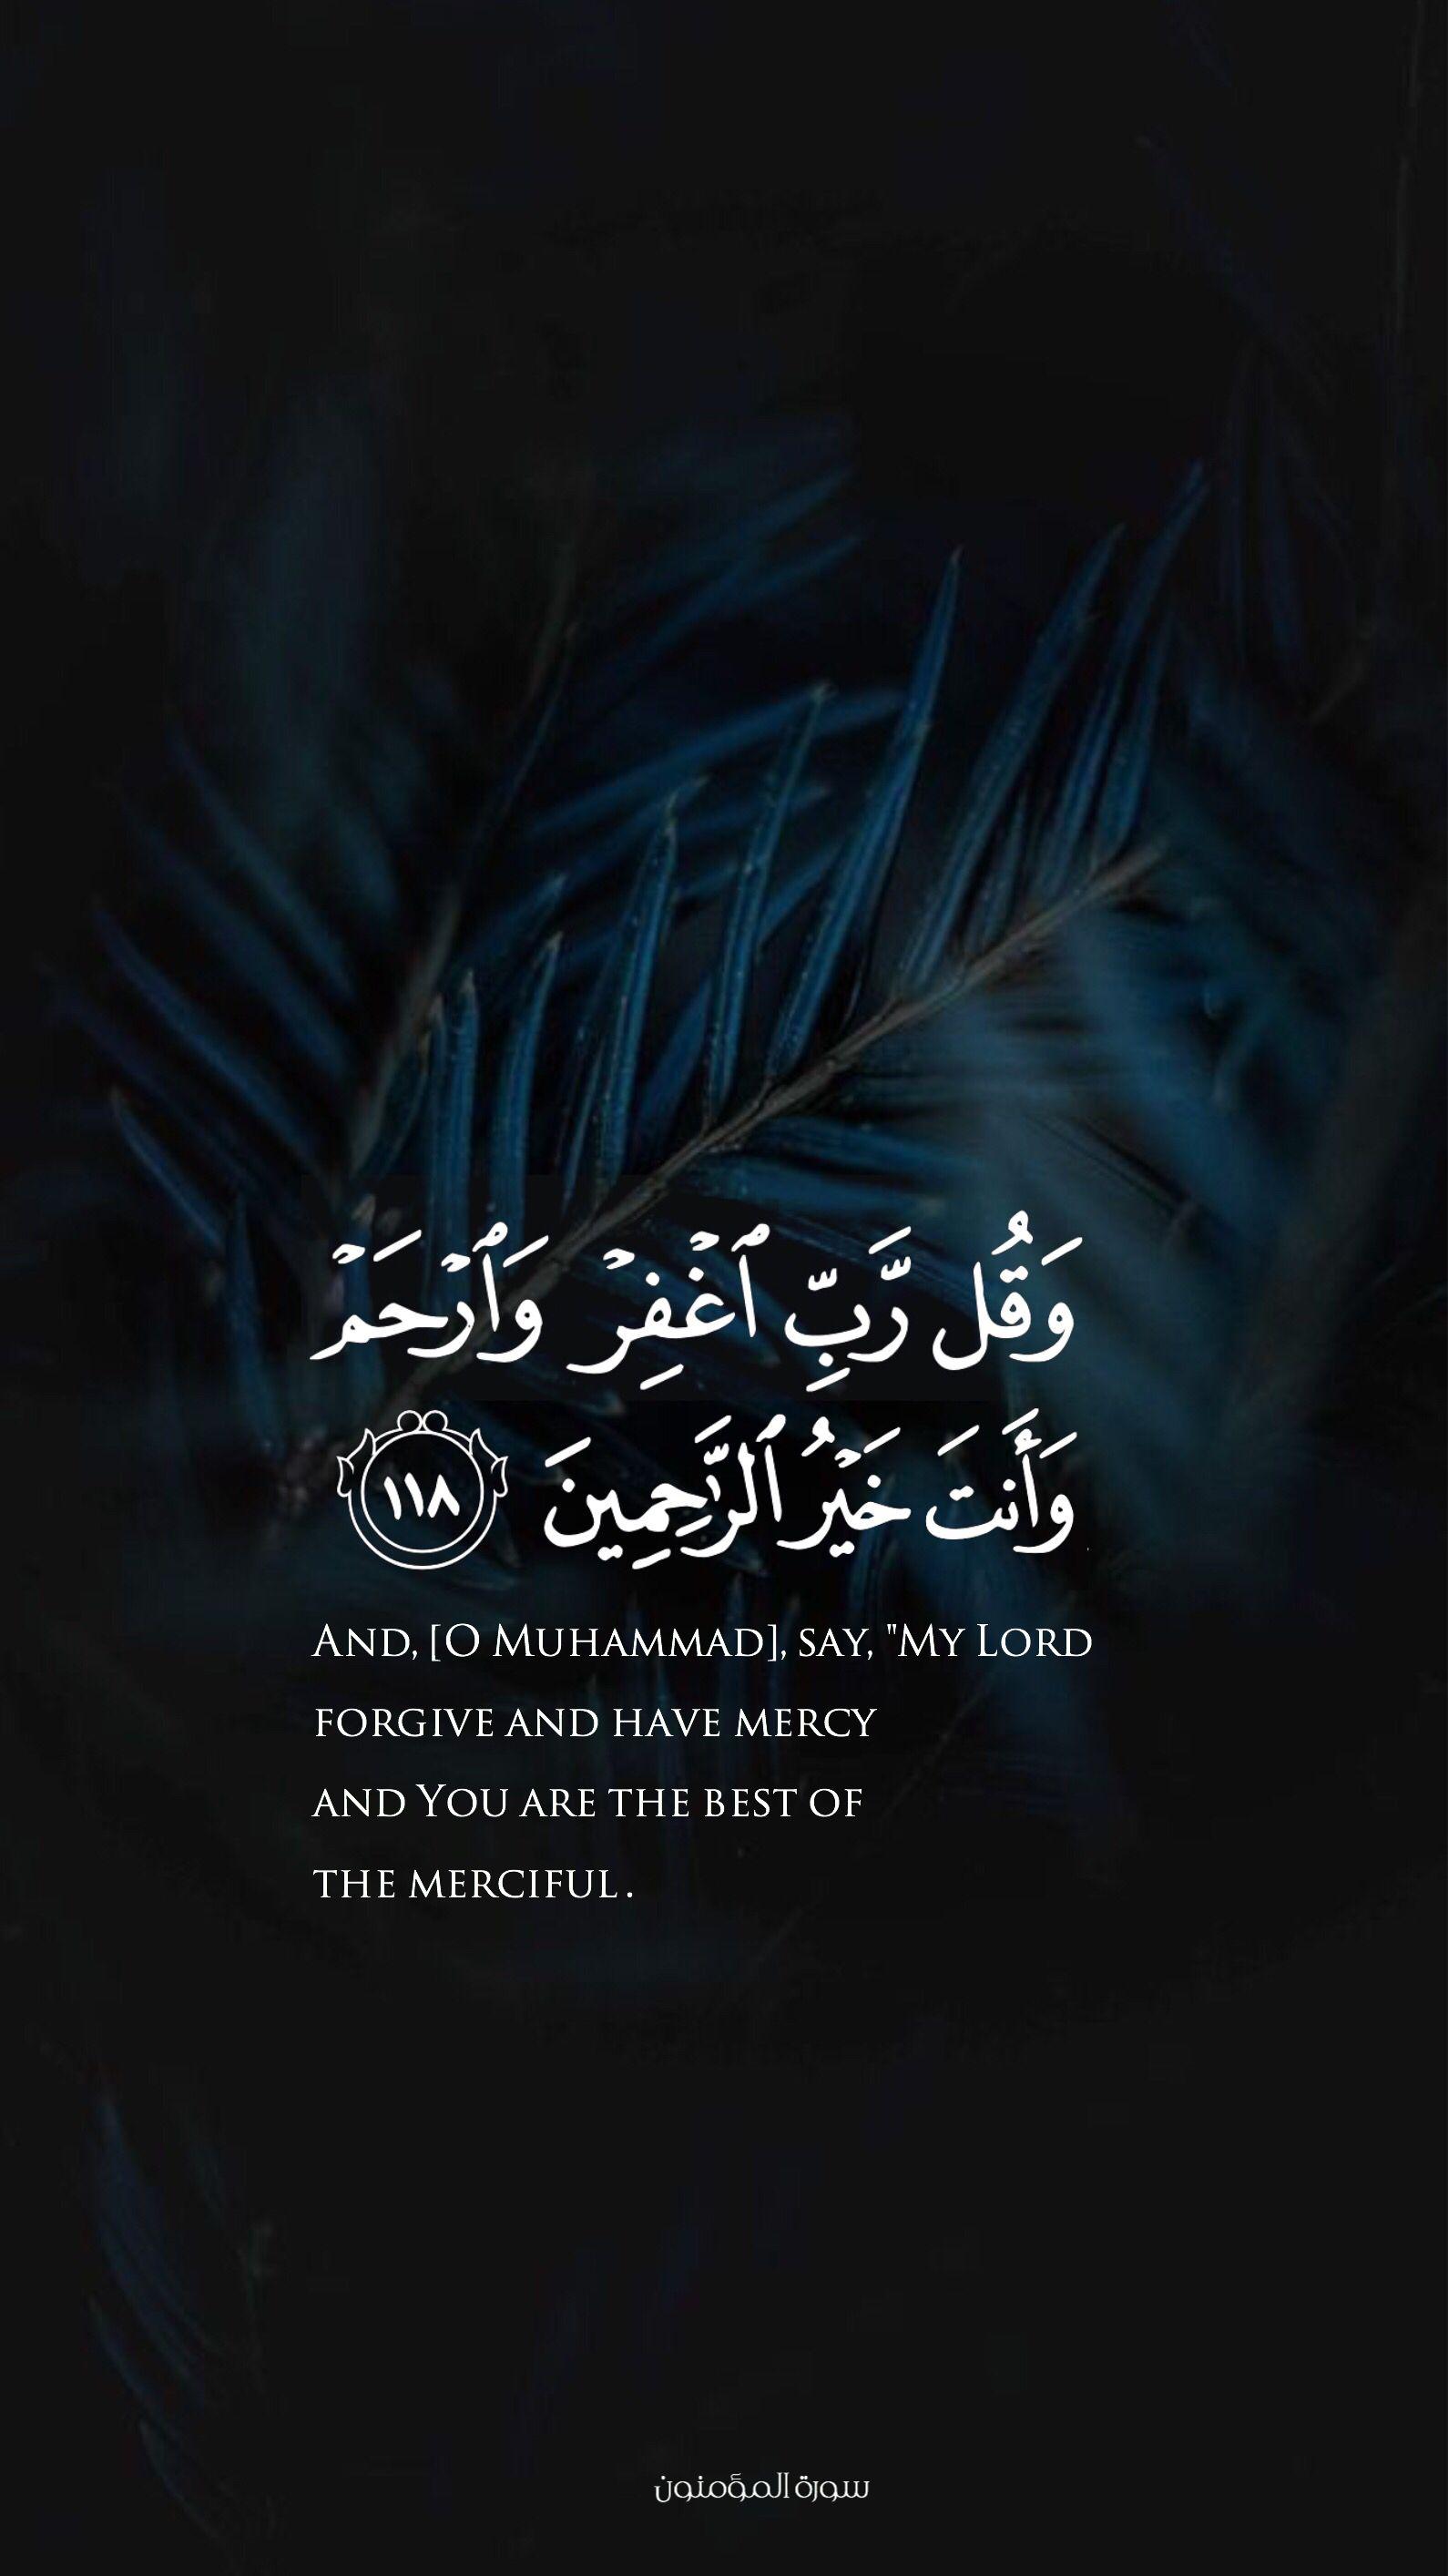 ايات قران ايات قرانية يارب Quran Quotes Quran Quotes Love Quran Verses